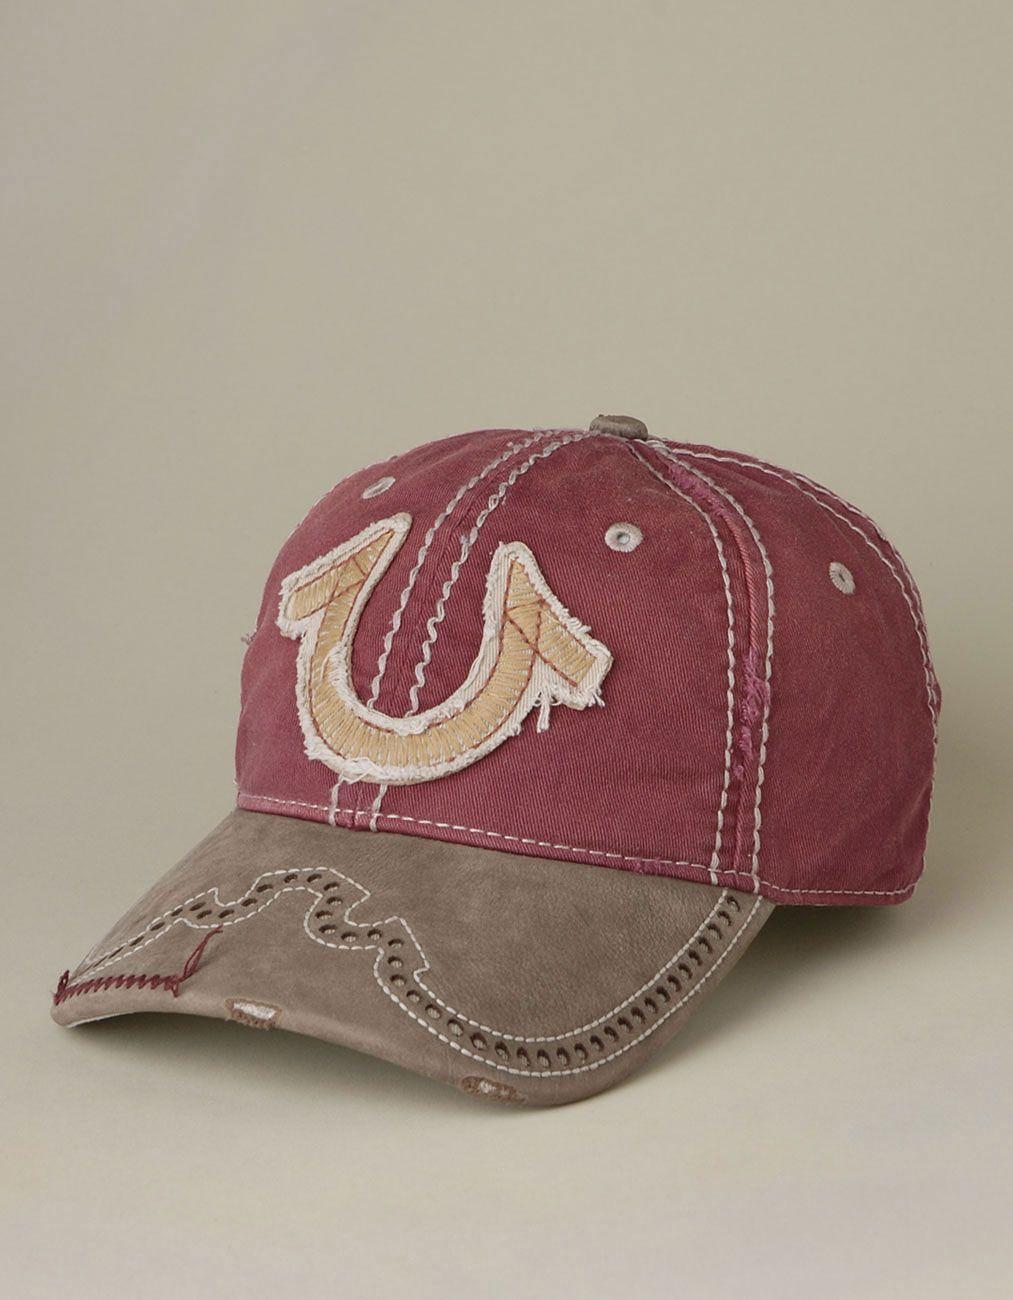 mens western horseshoe logo baseball cap redwood true religion brand jeans s s 2014 hats. Black Bedroom Furniture Sets. Home Design Ideas